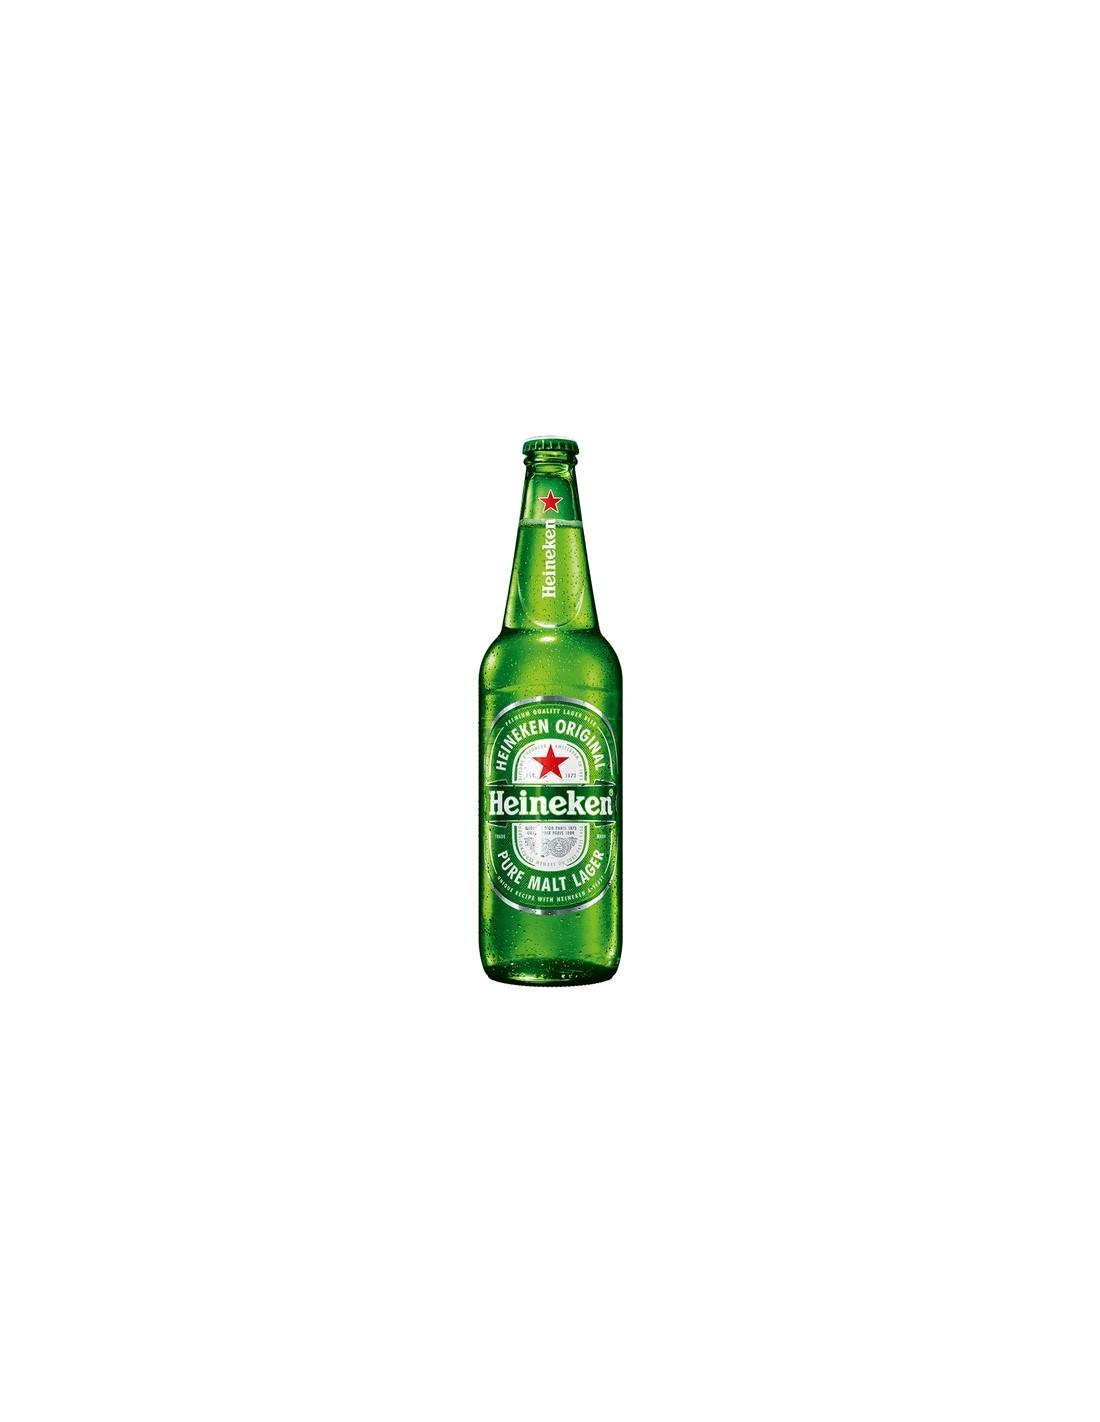 Bere blonda, filtrata Heineken Premium, 5% alc., 0.66L